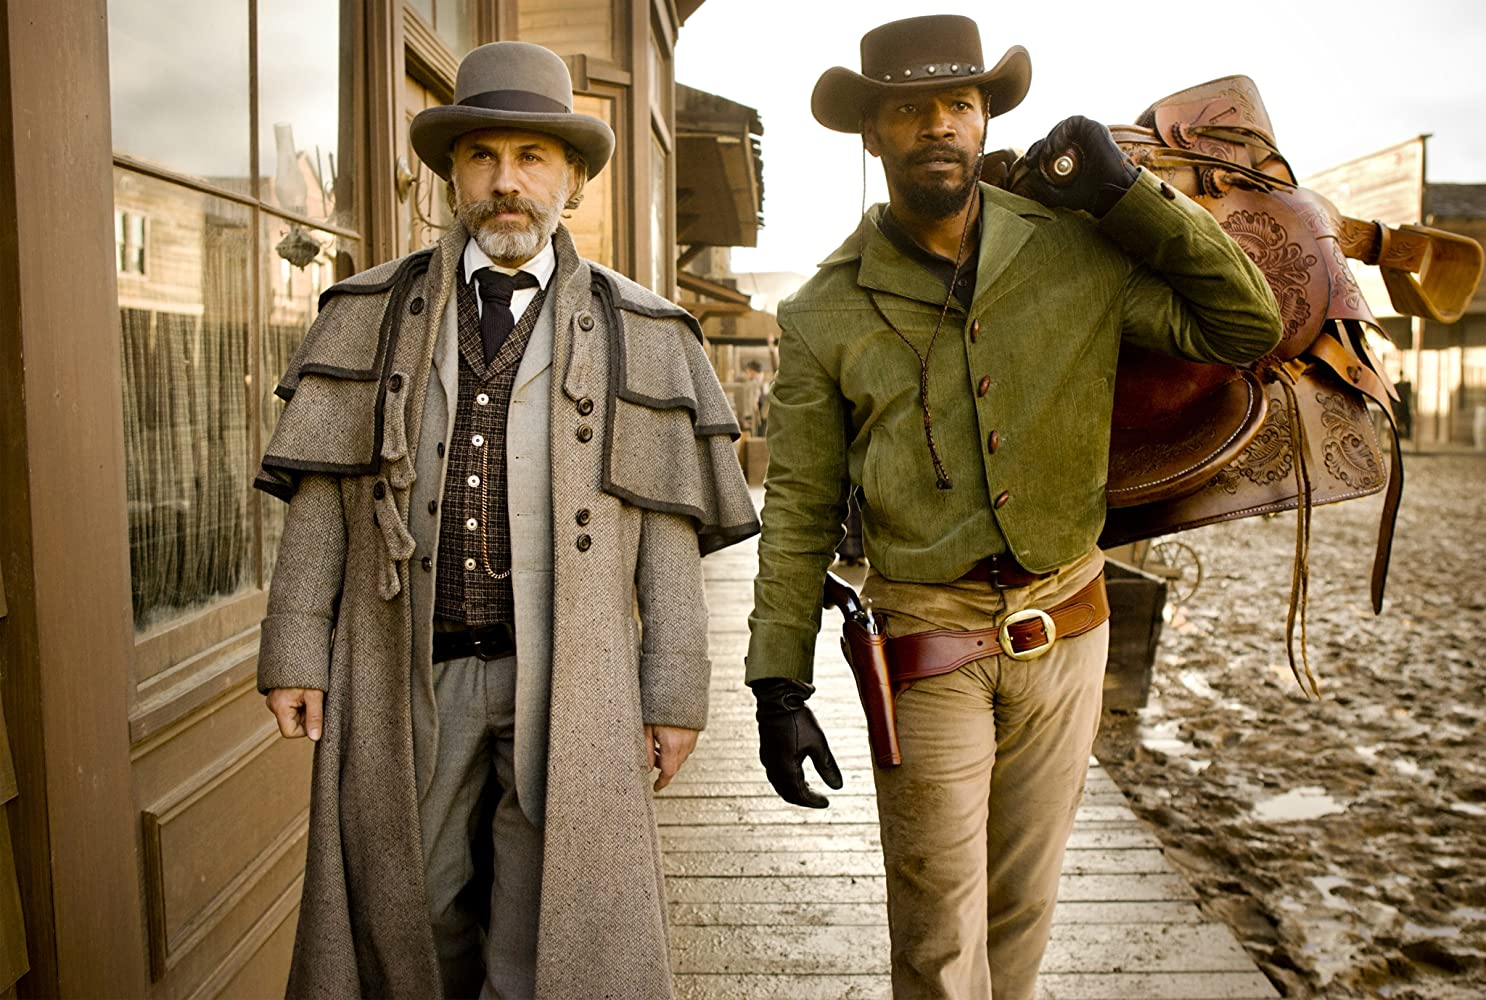 Django Unchained, Quentin Tarantino - CREDITS: IMDB.com